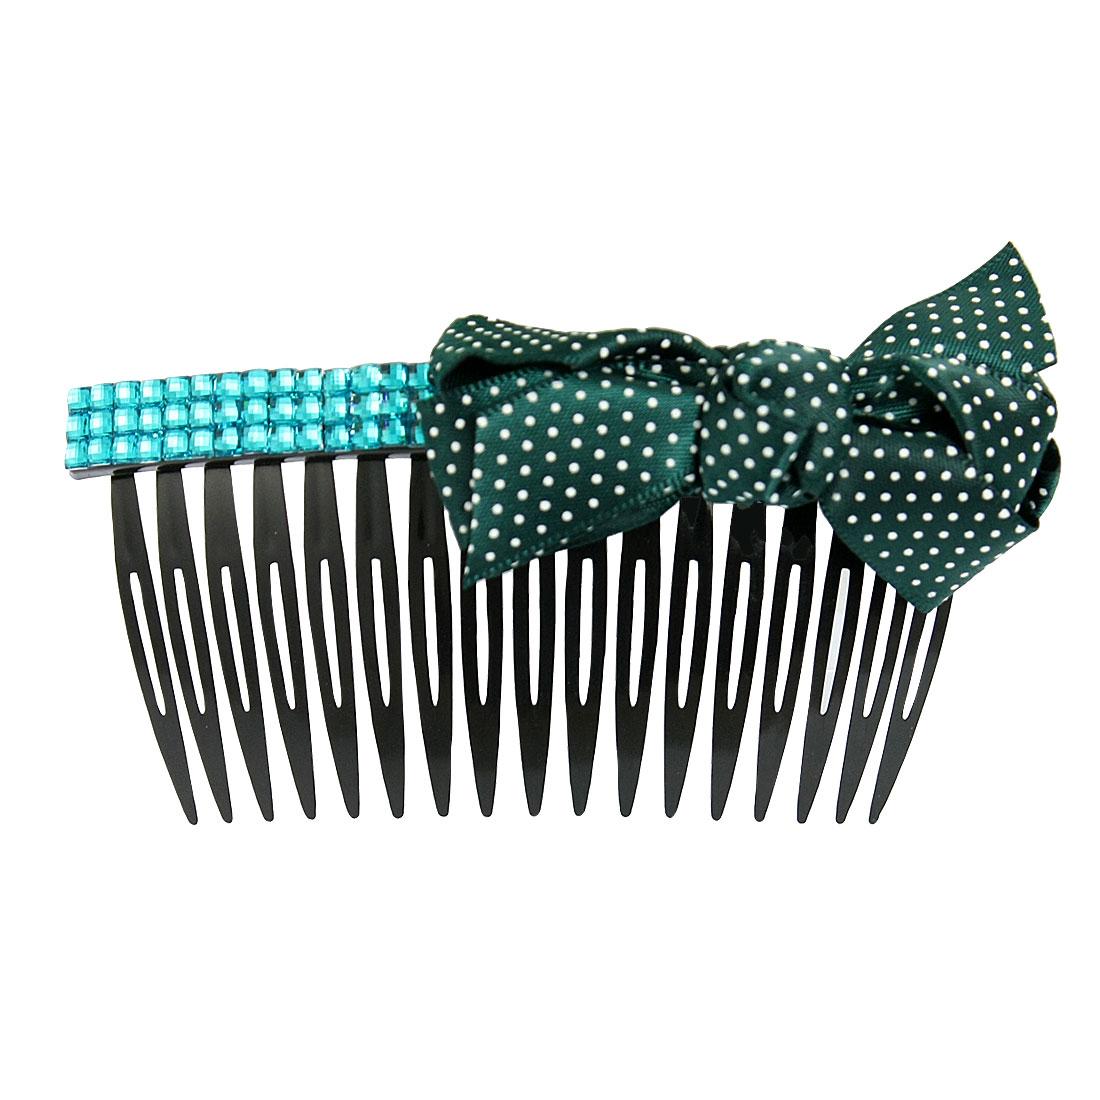 Dark Green Ribbon Bow Tie Rhinestone Accent Black Plastic Hair Comb